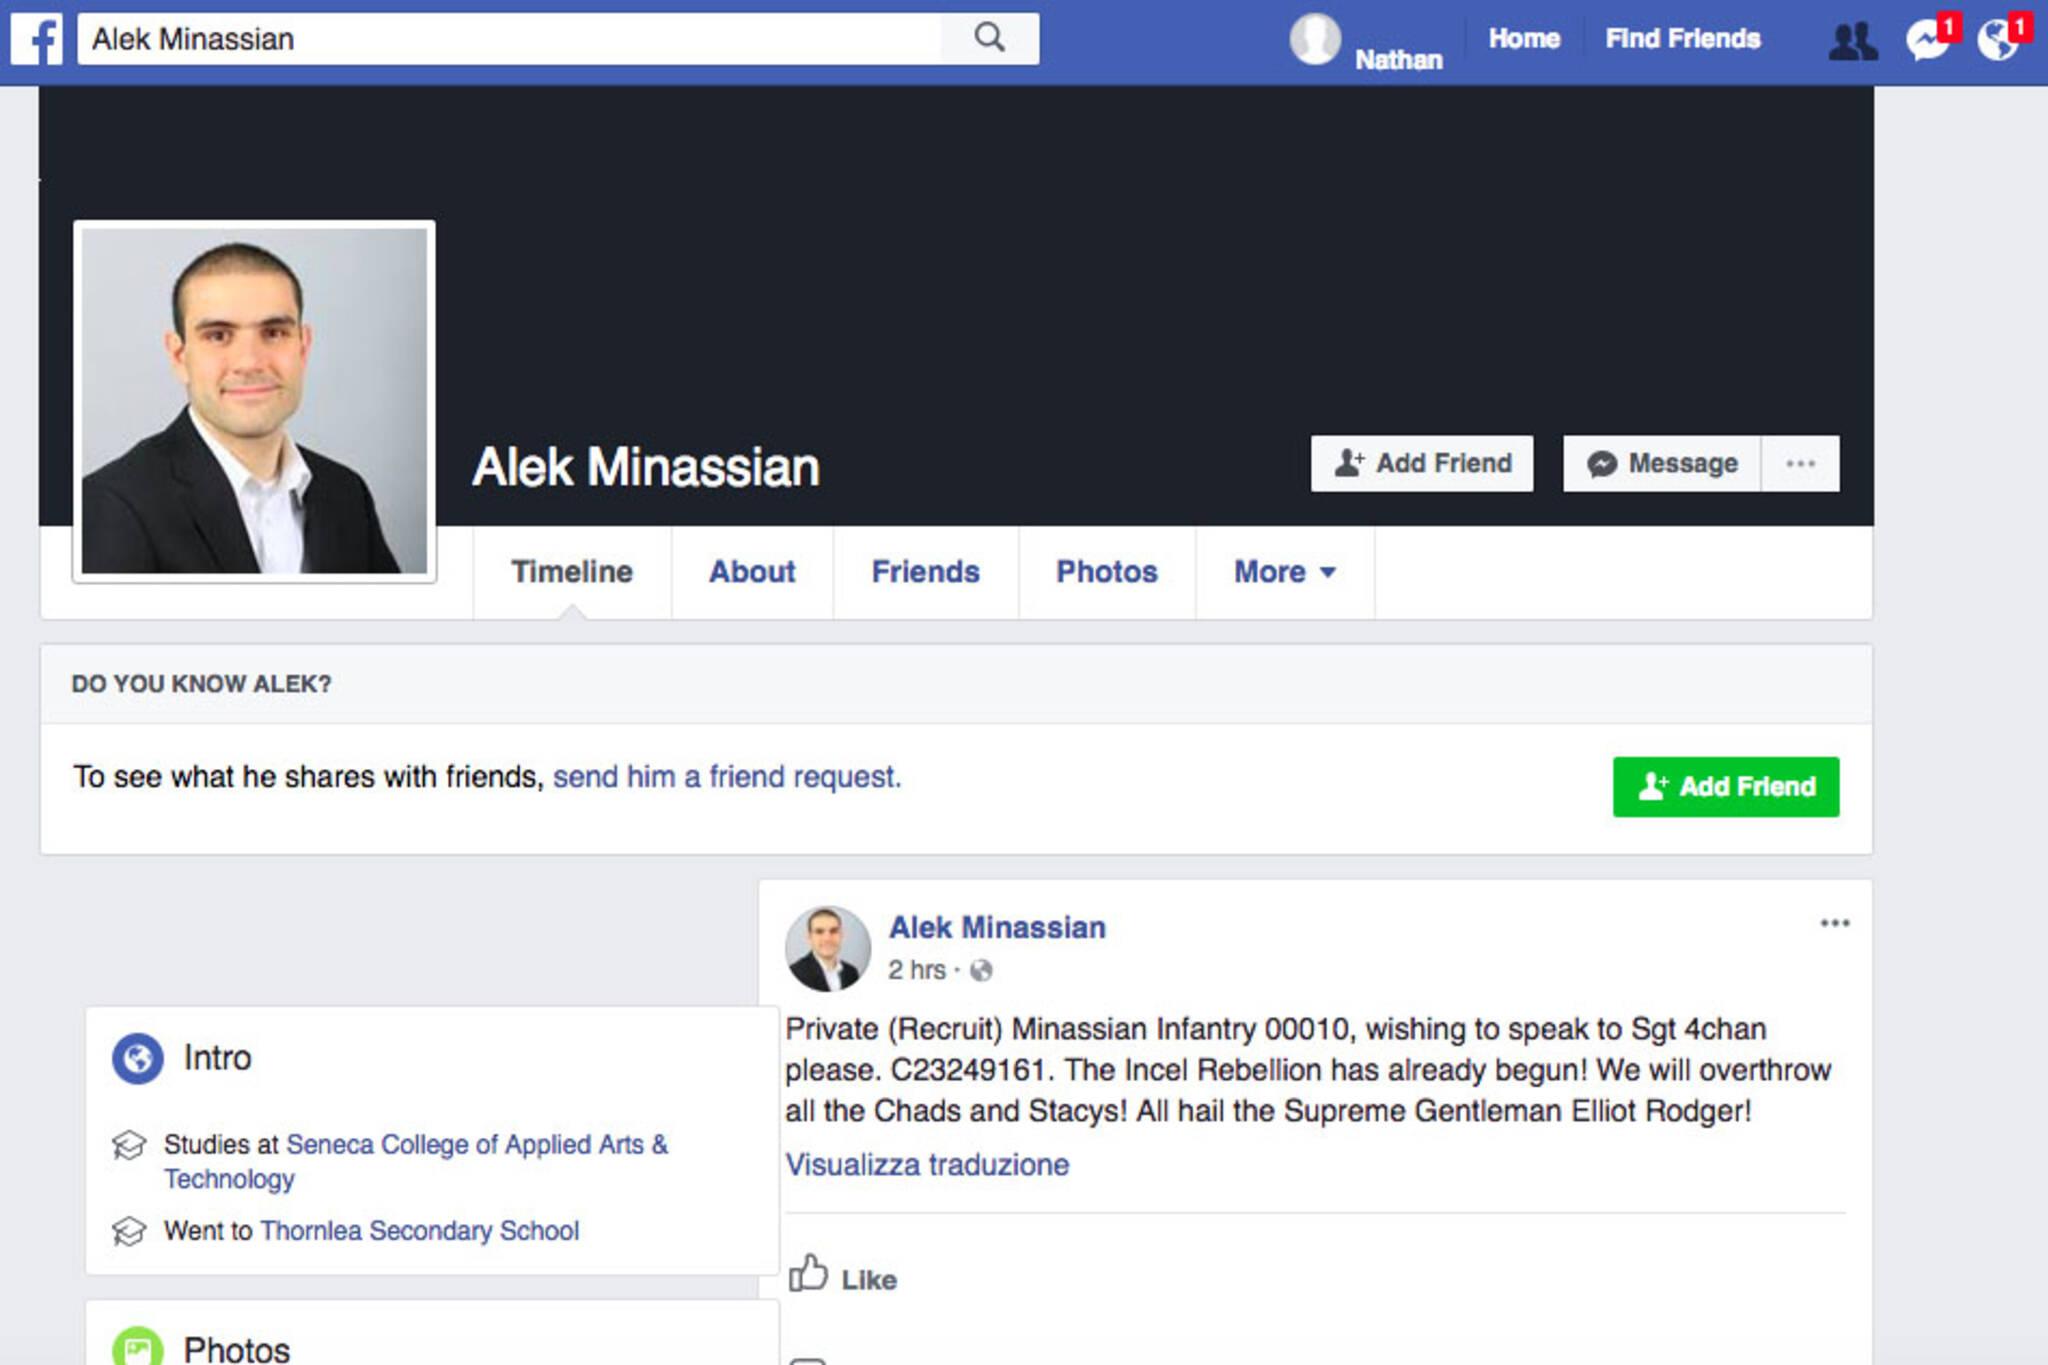 Alek Minassian Facebook